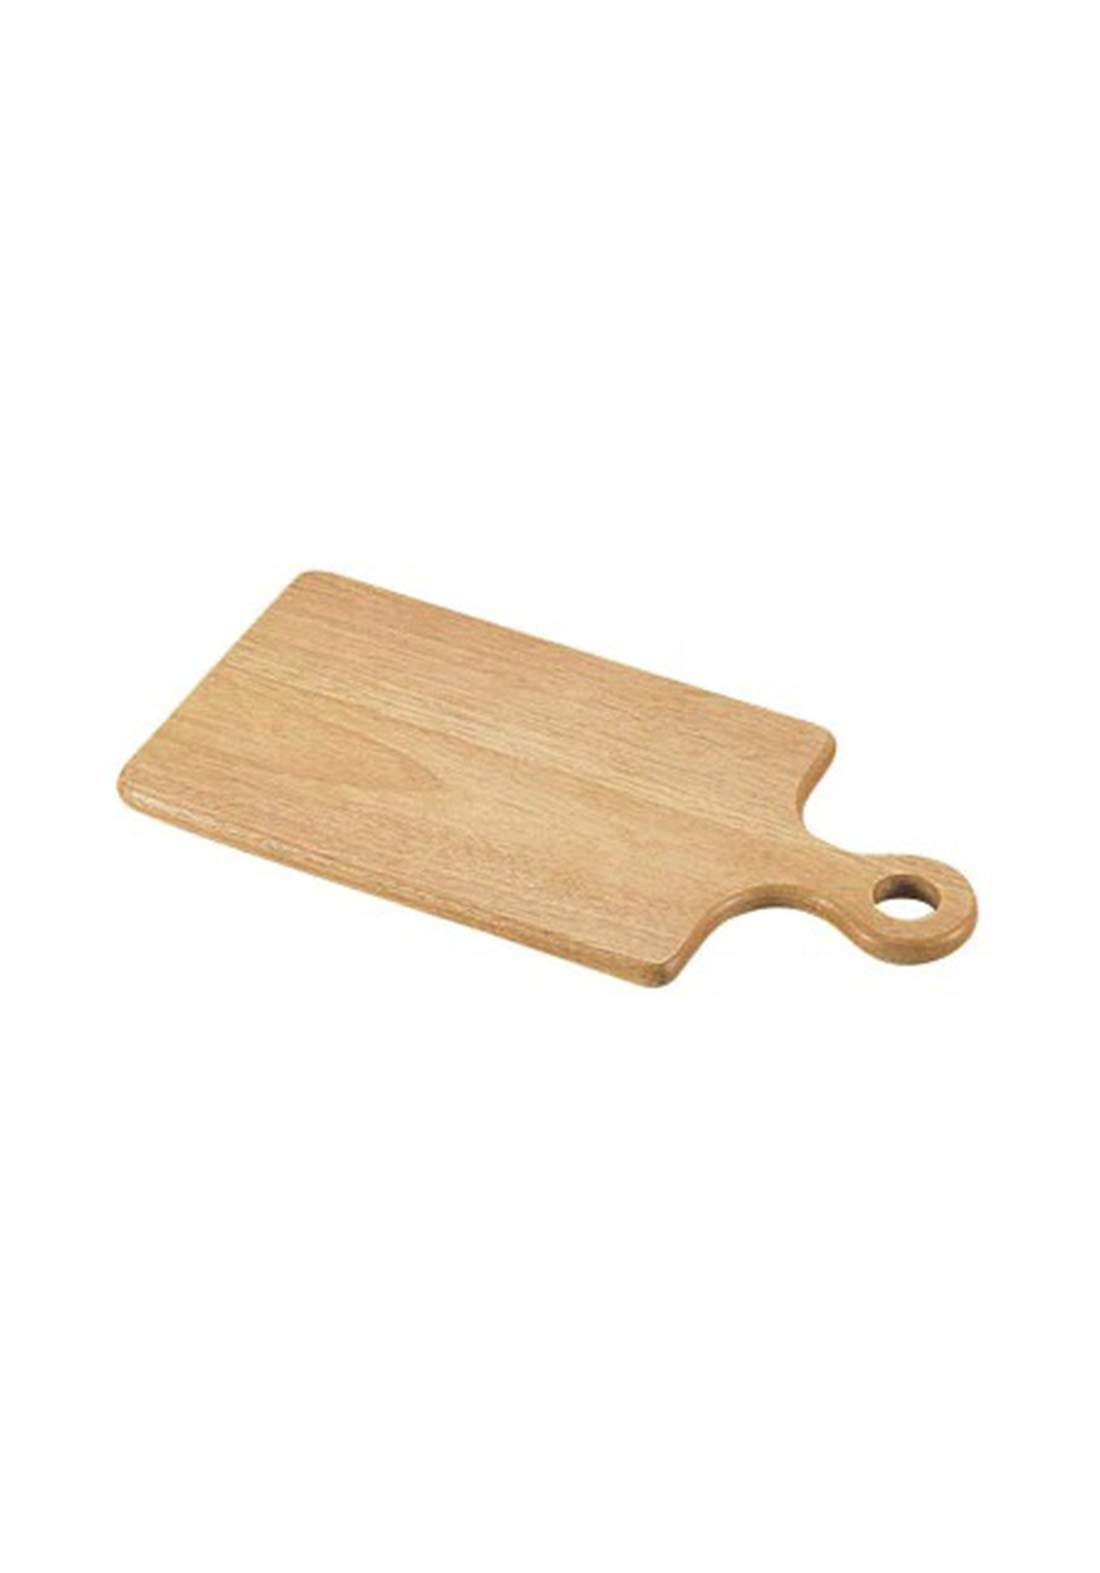 Pearl Metal H-3661 Flare cutting board لوح تقطيع